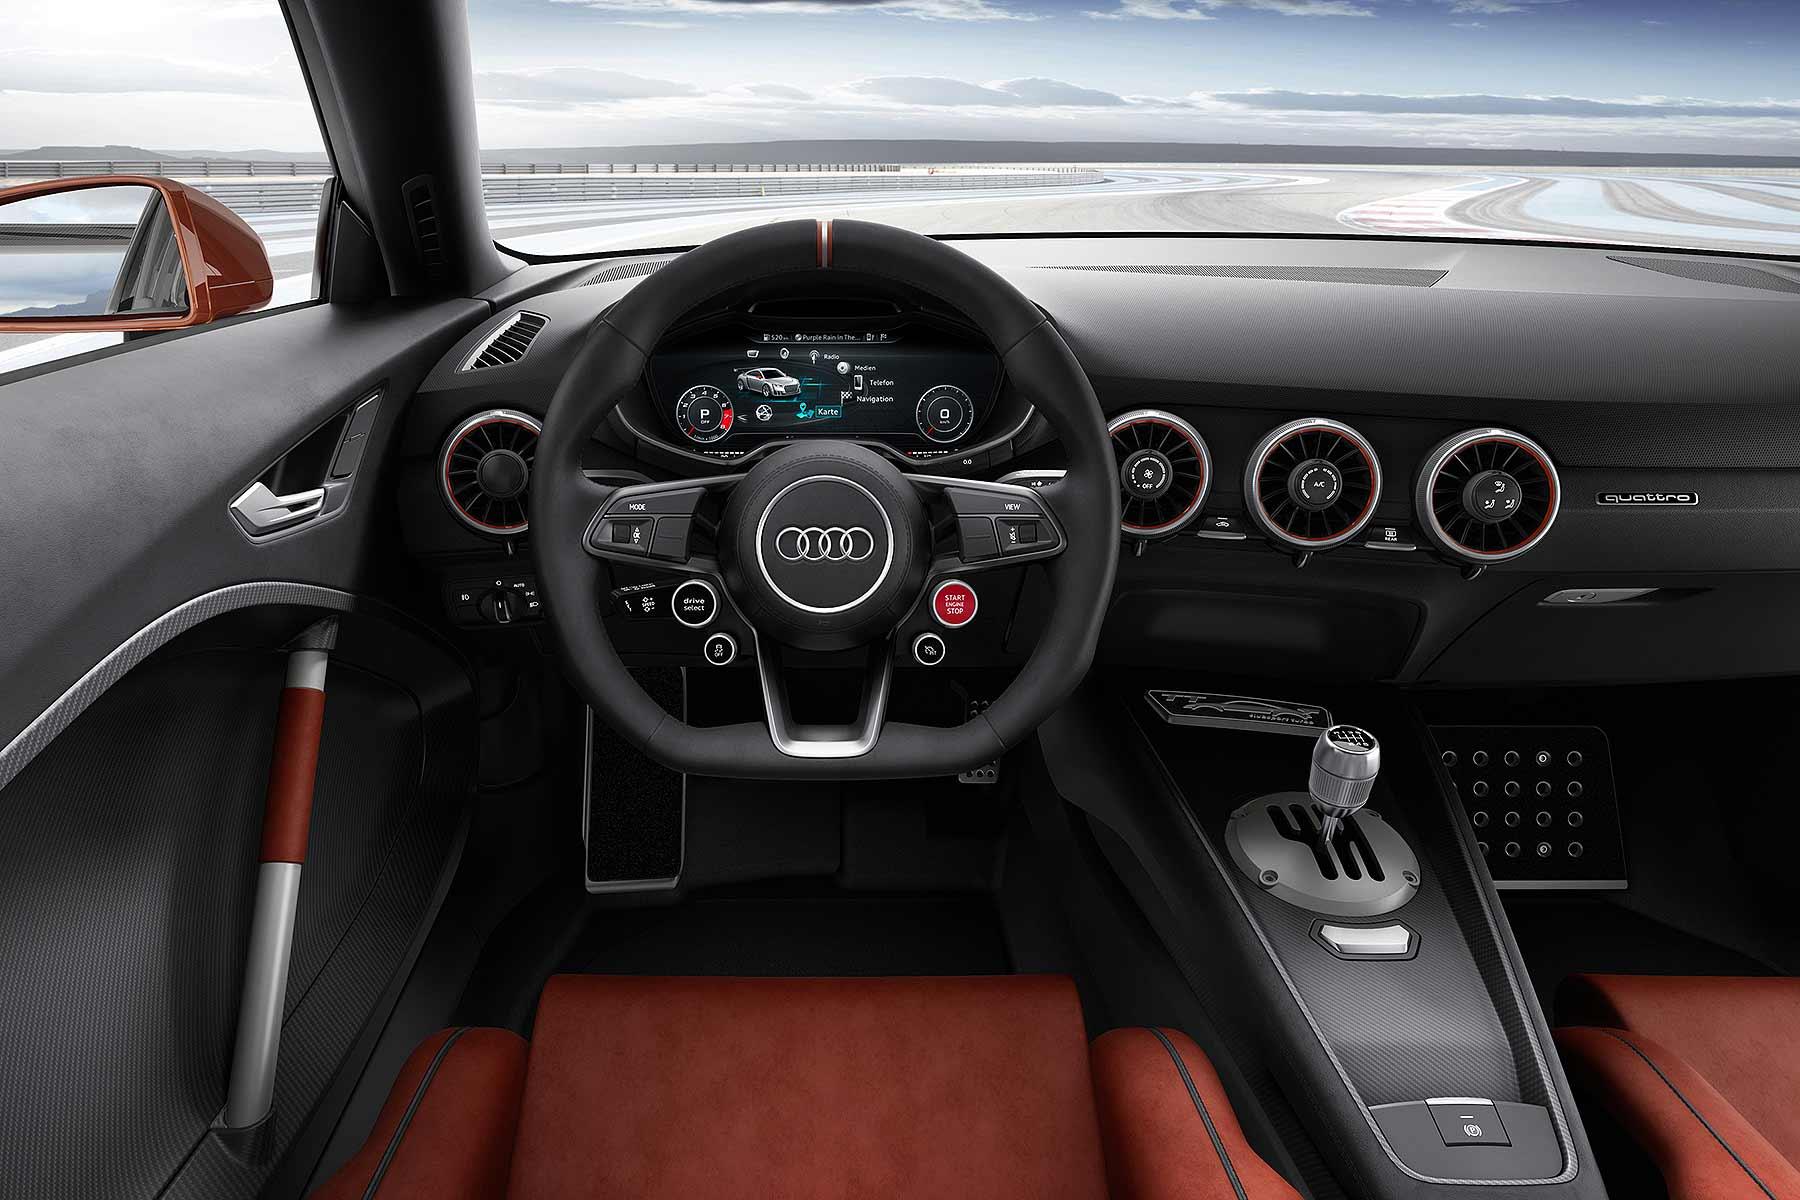 Audi TT Clubsport turbo concept Worthersee 2015